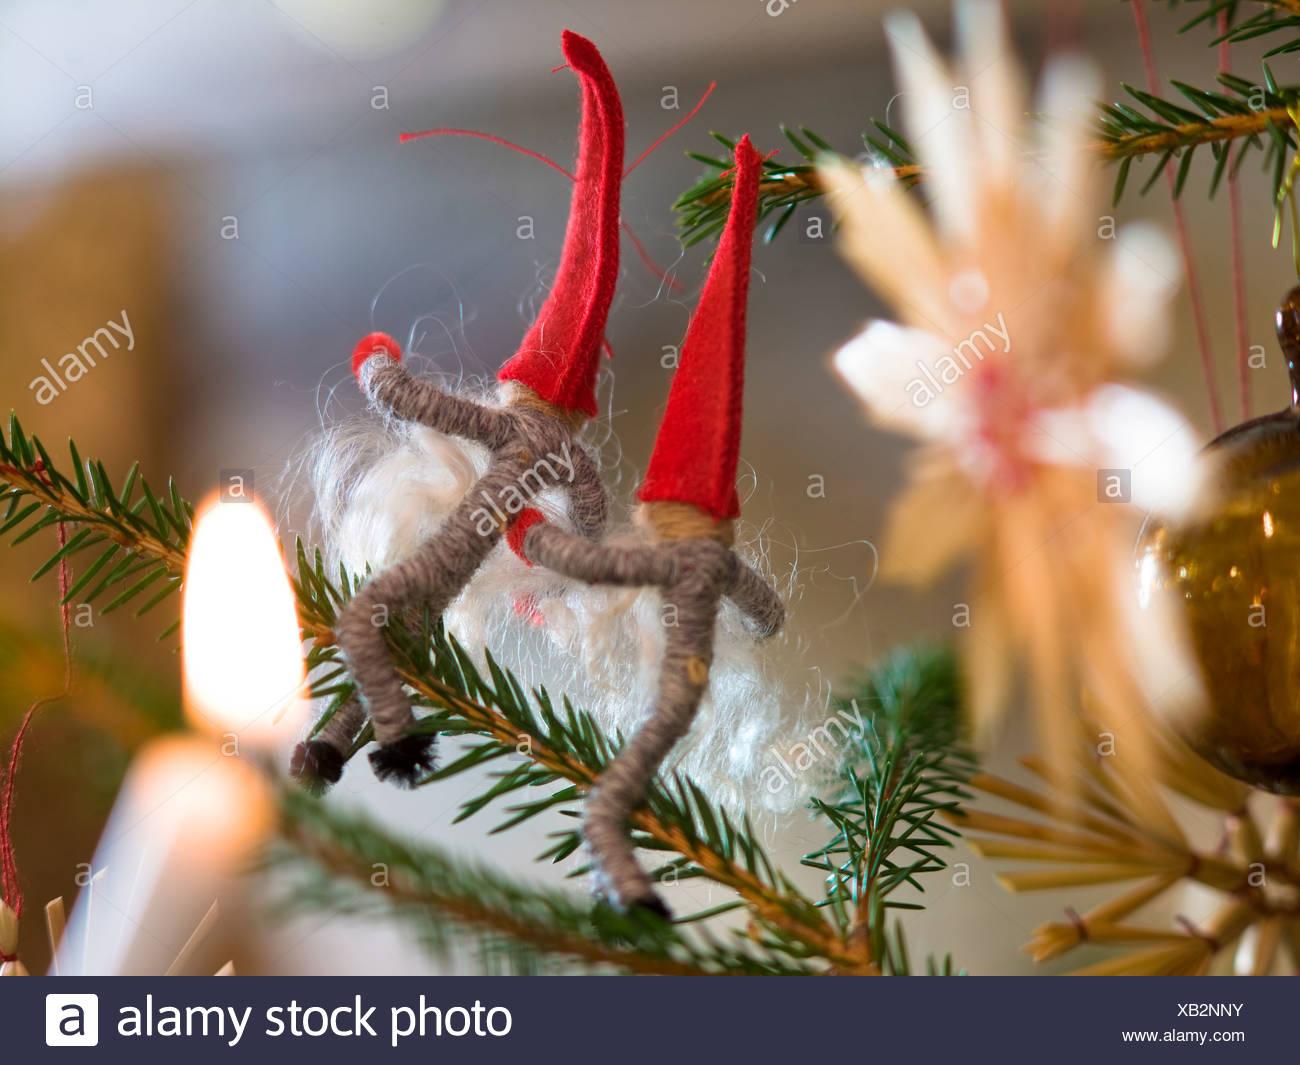 Christmas tree decoration, close-up. - Stock Image